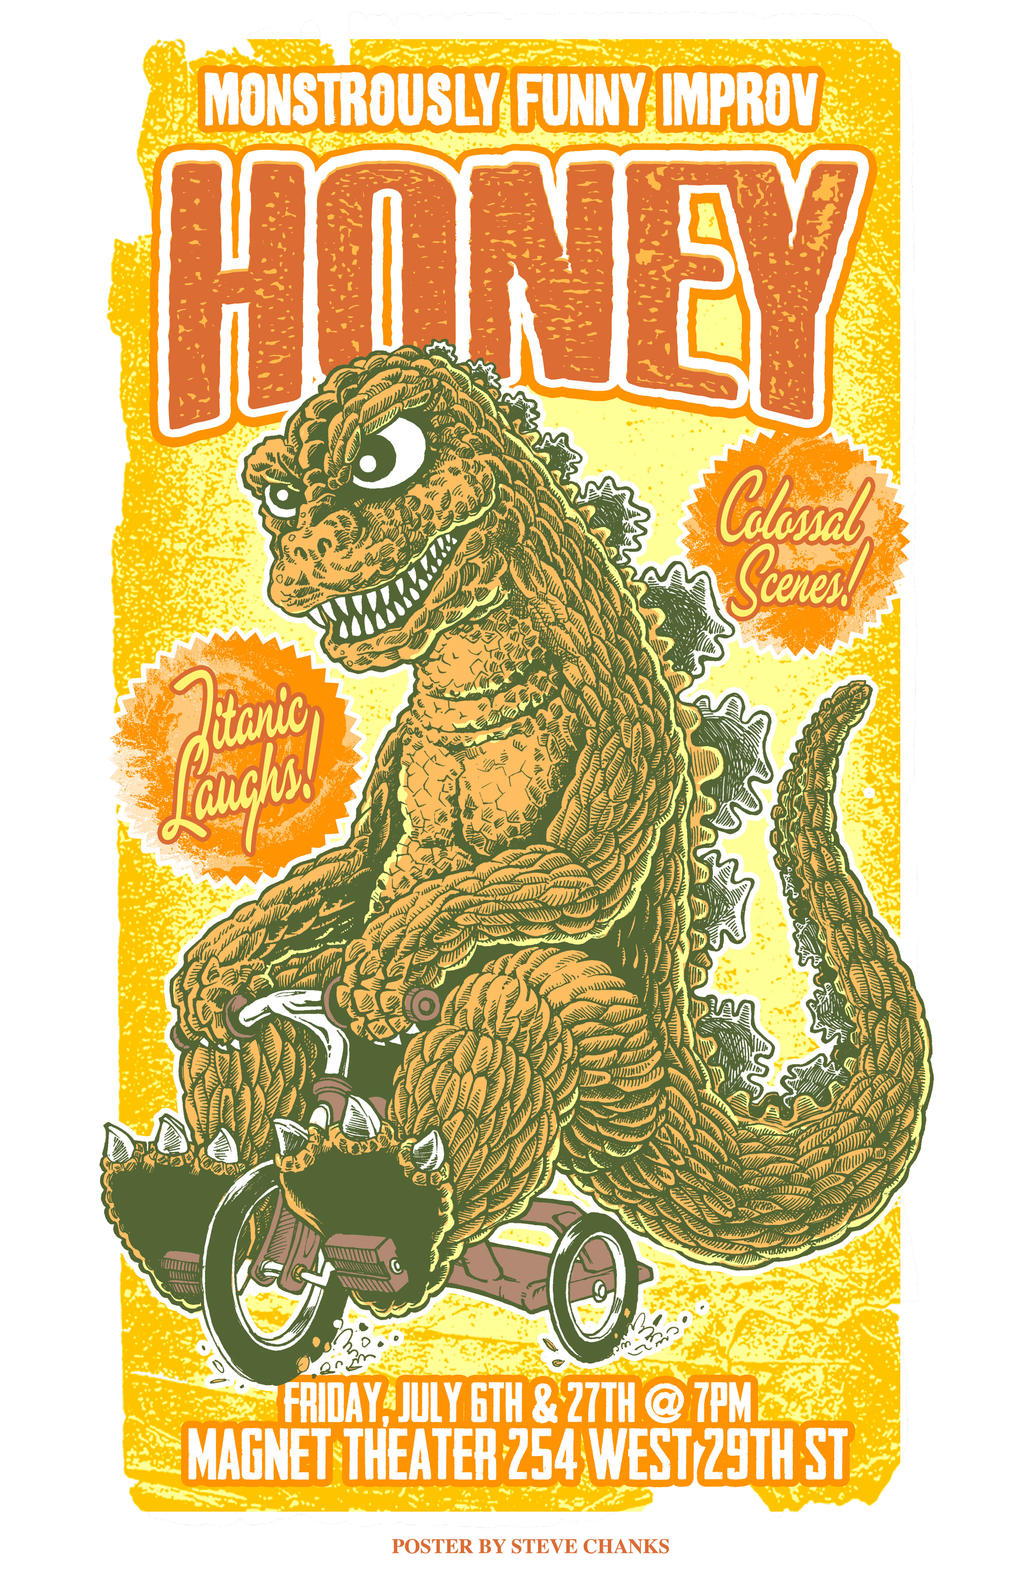 Honey, Monstrously Funny Improv by SteveChanks